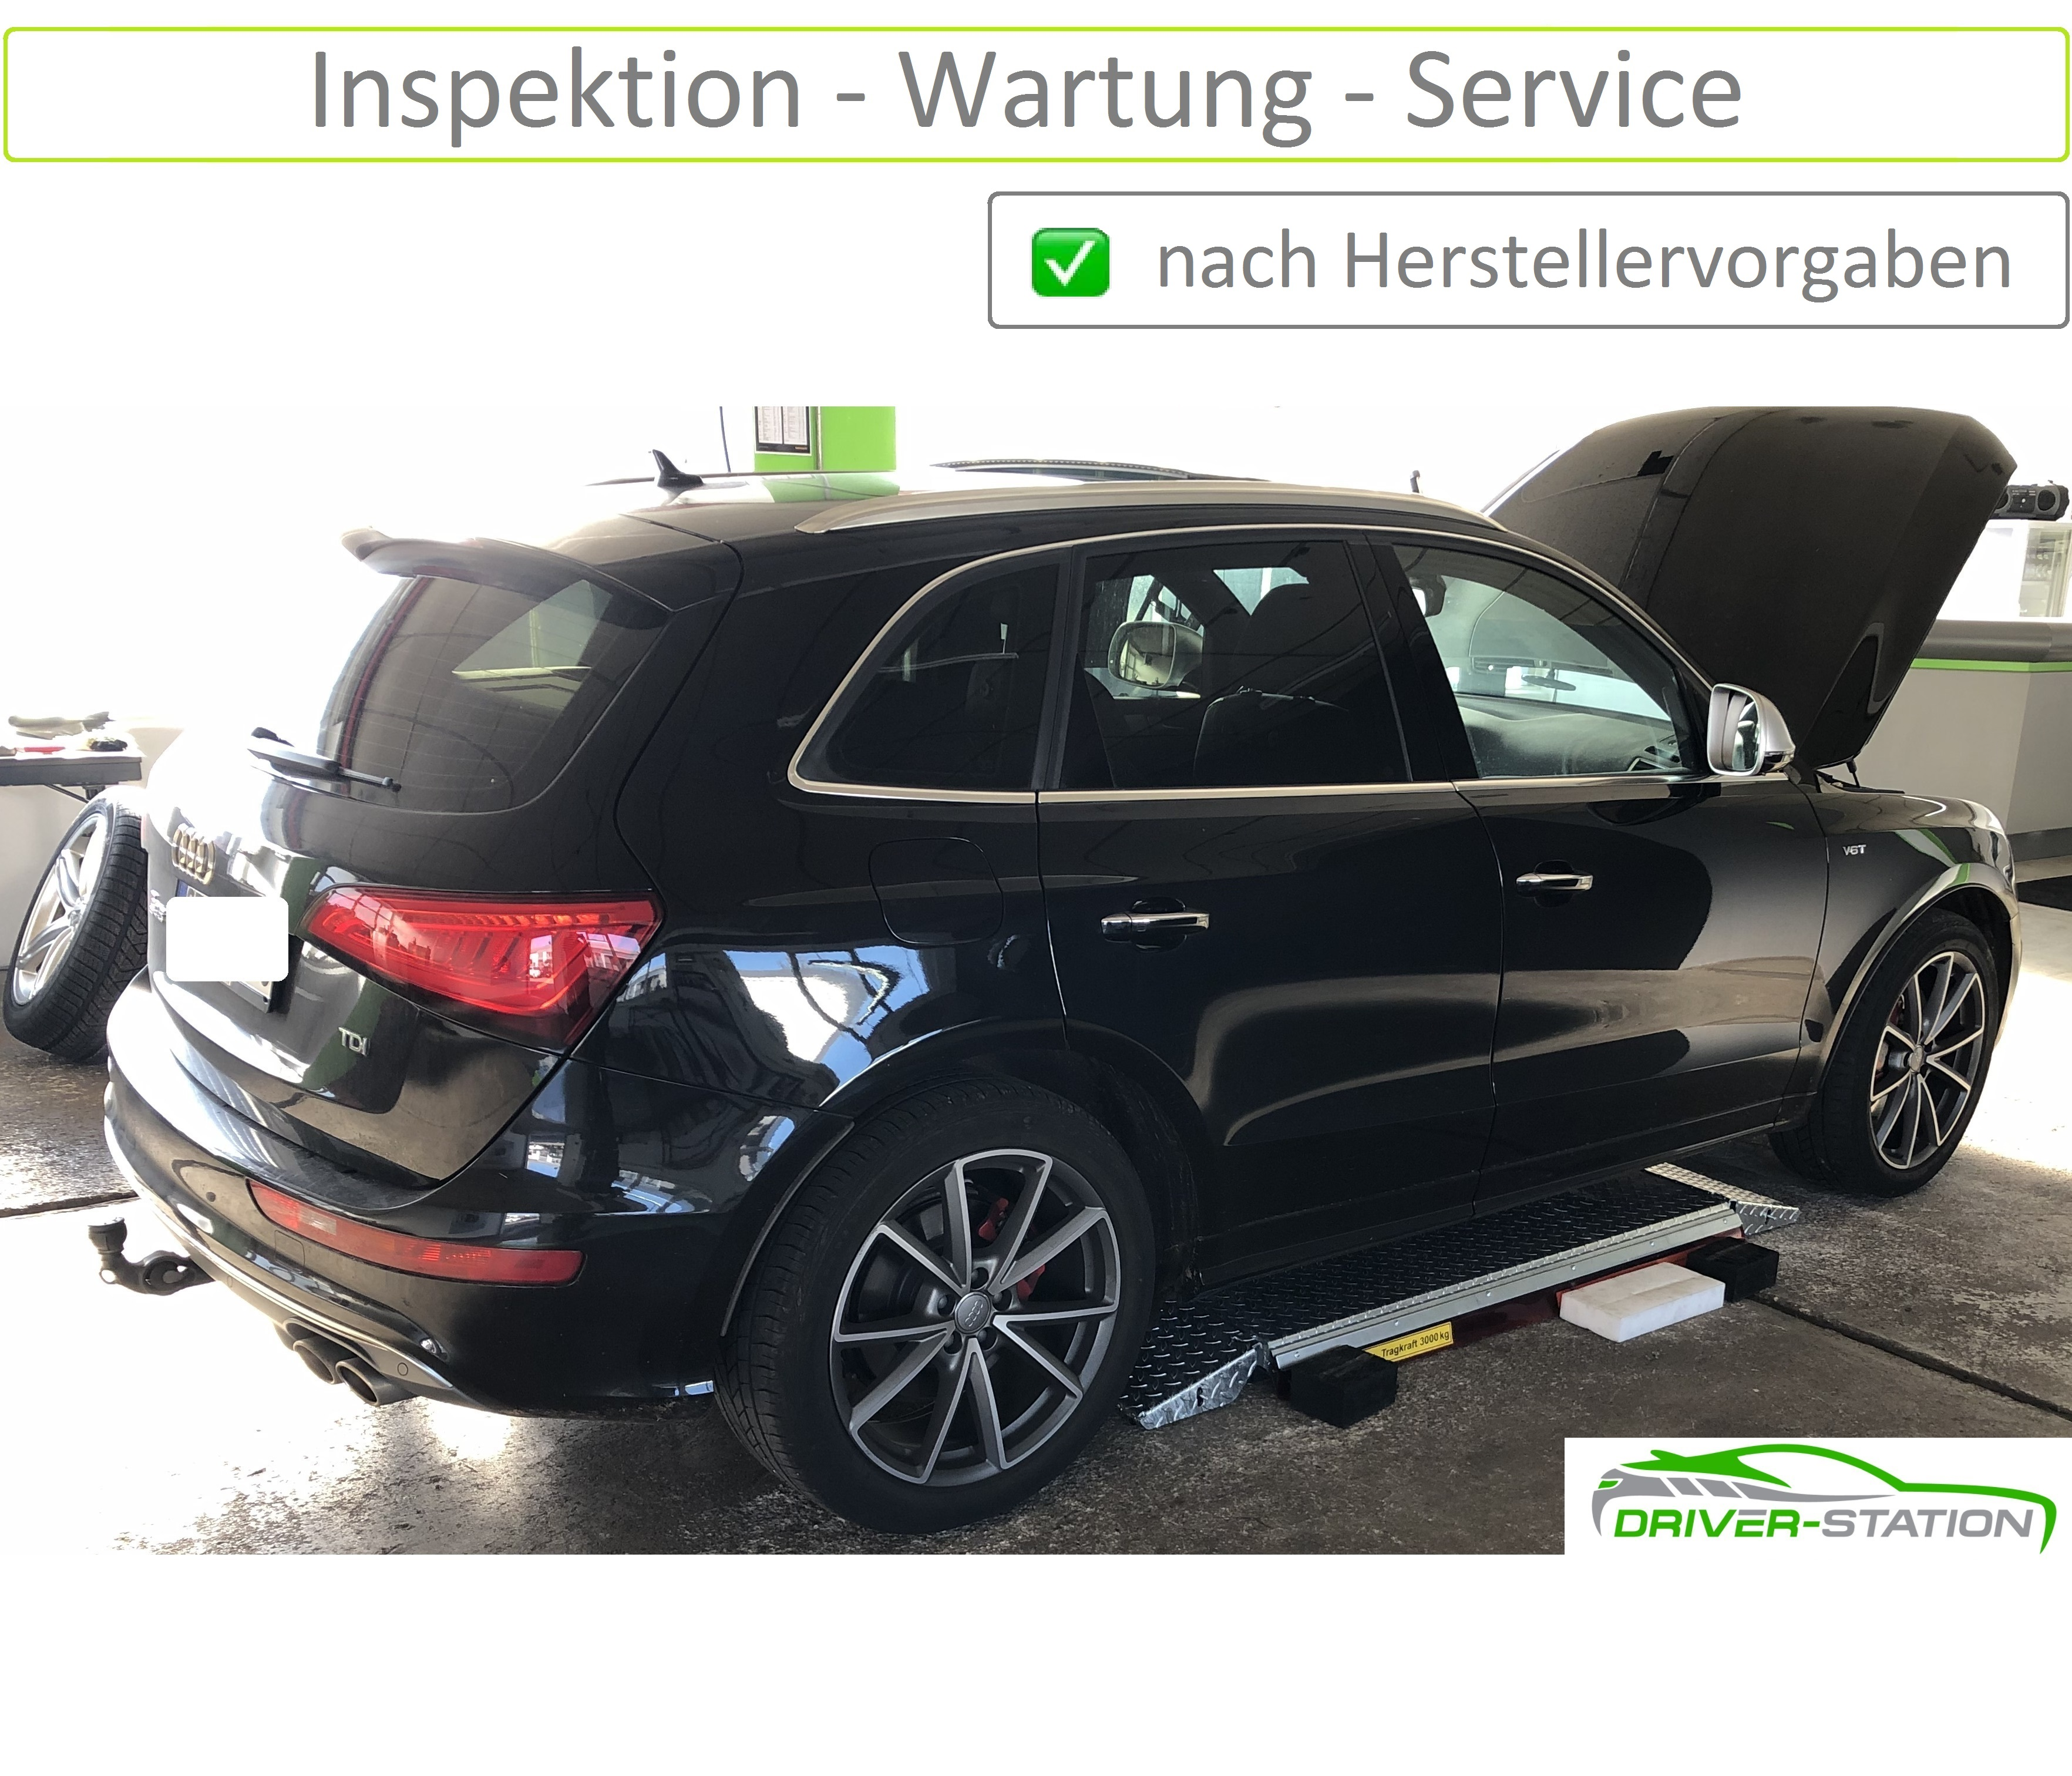 Inspektion Wartung Service Autowerkstatt Driver-Station Starnberg